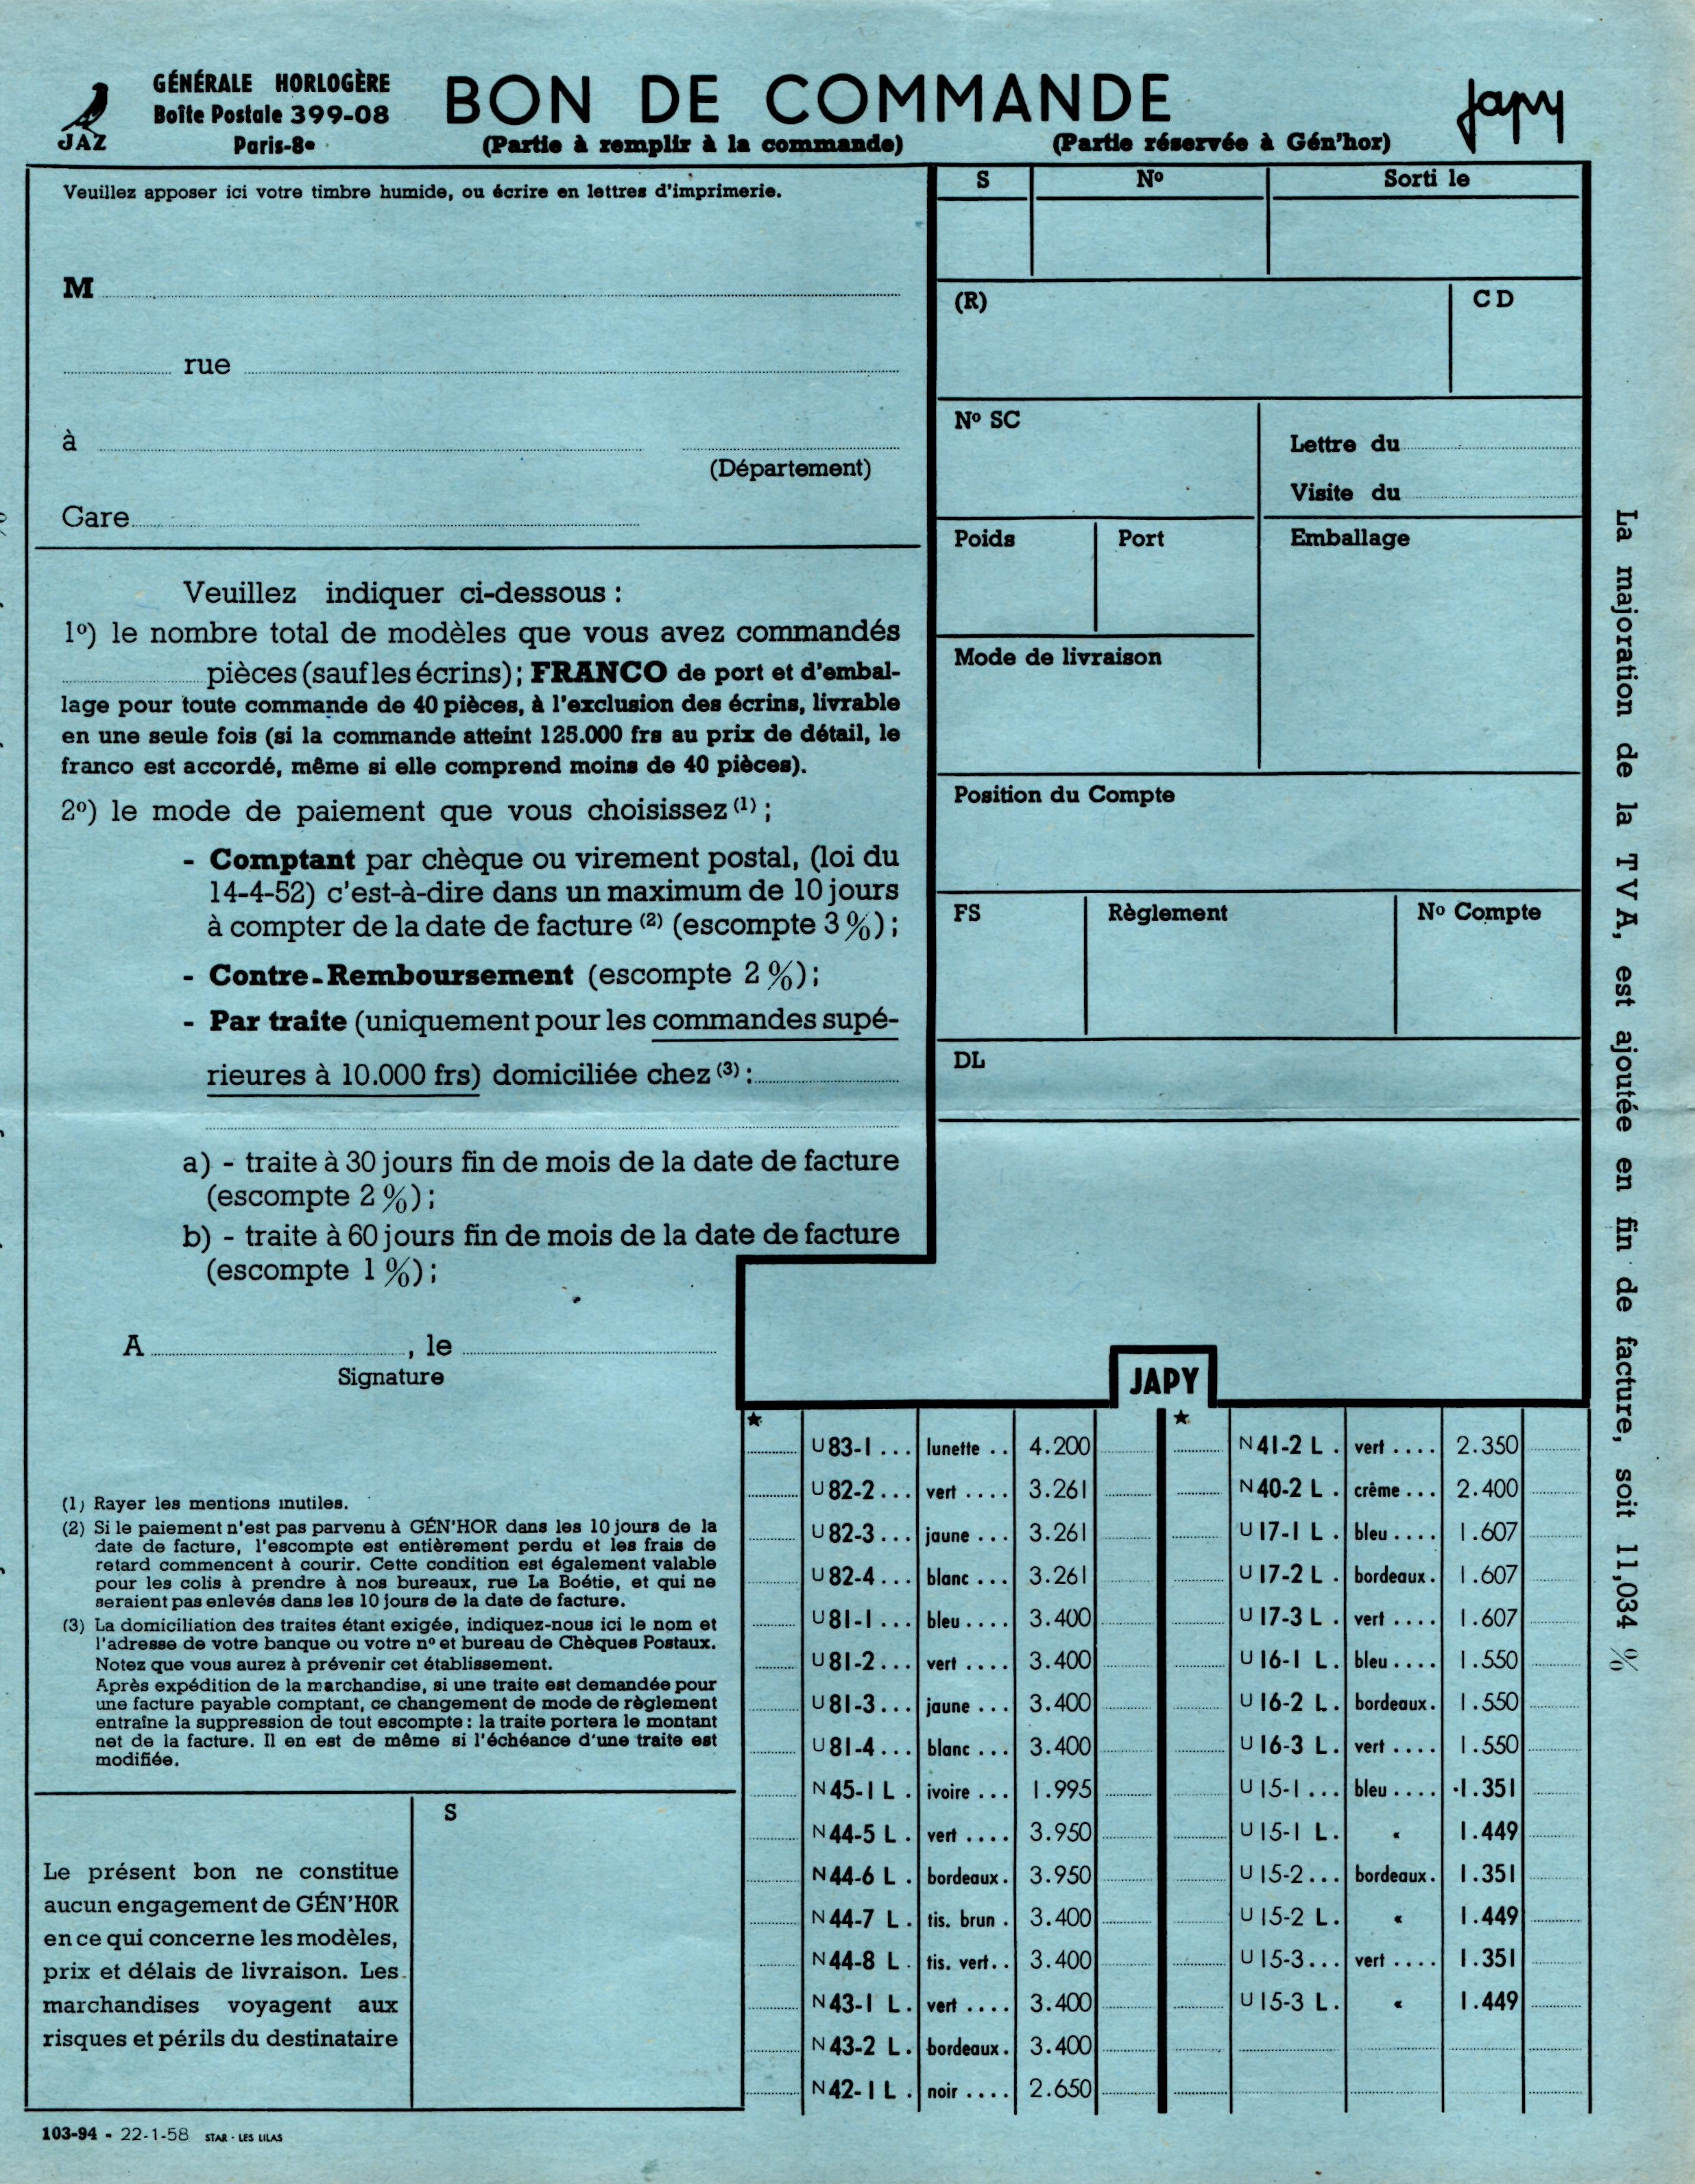 1957 bon de commande tarif FB 57 janvier 1958 page 2